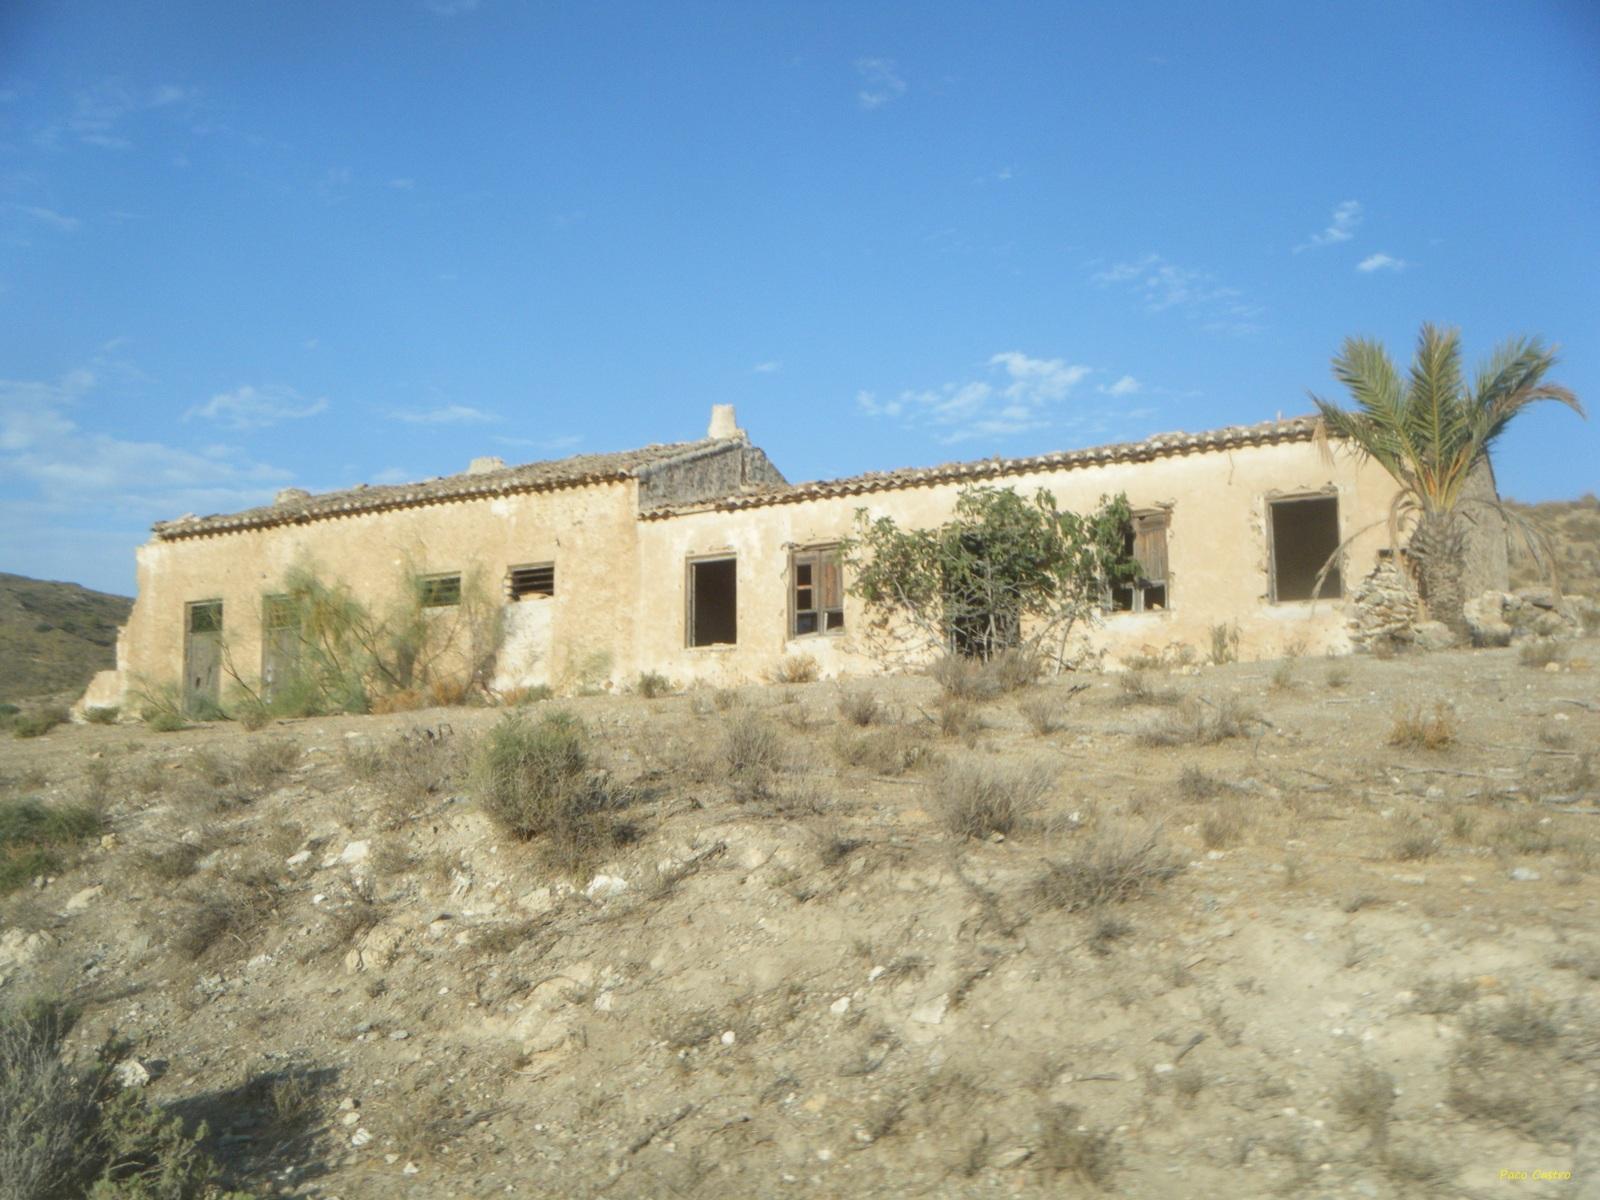 Mina 2º San Antonio, Bco. de la Francesa, Zurgena, Almeria, Andalucia, España 2nv6vlx